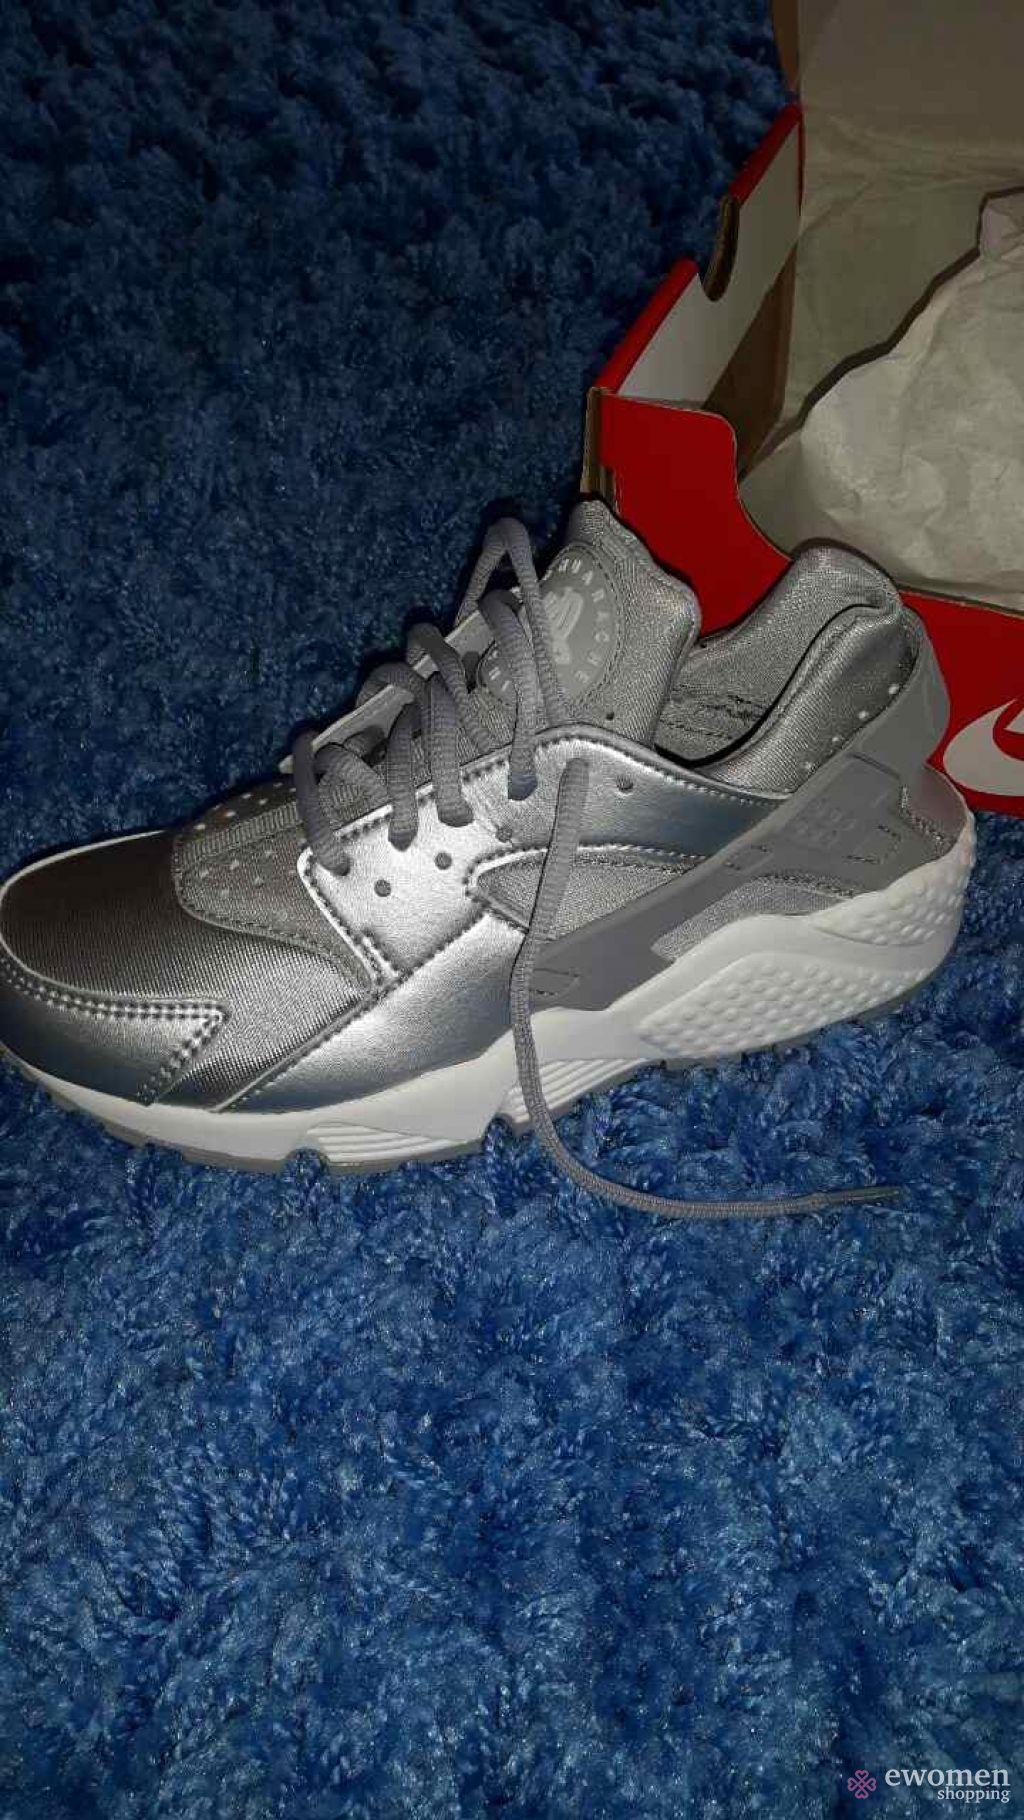 Eredeti női Nike cipő - eWomen Shopping bf3d7b7b3b